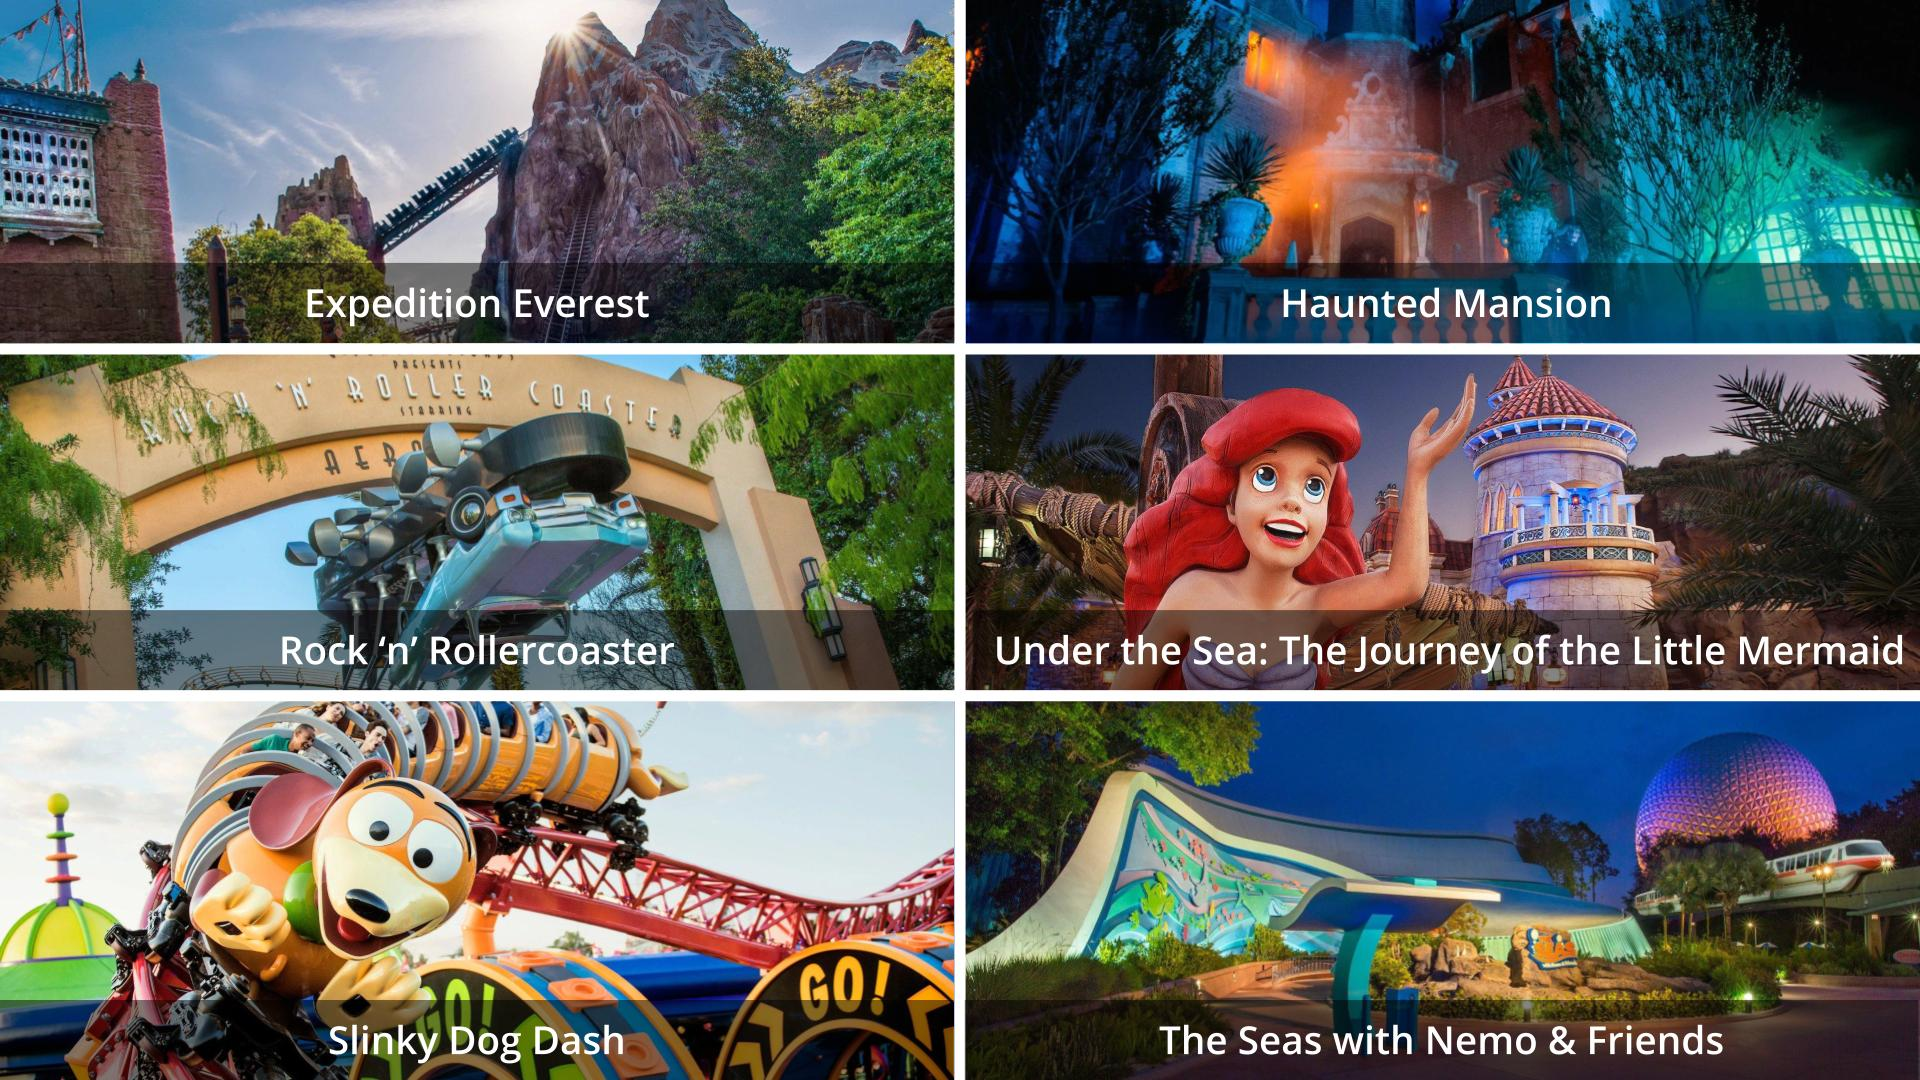 Walt Disney World Updates Ride Loading Protocols